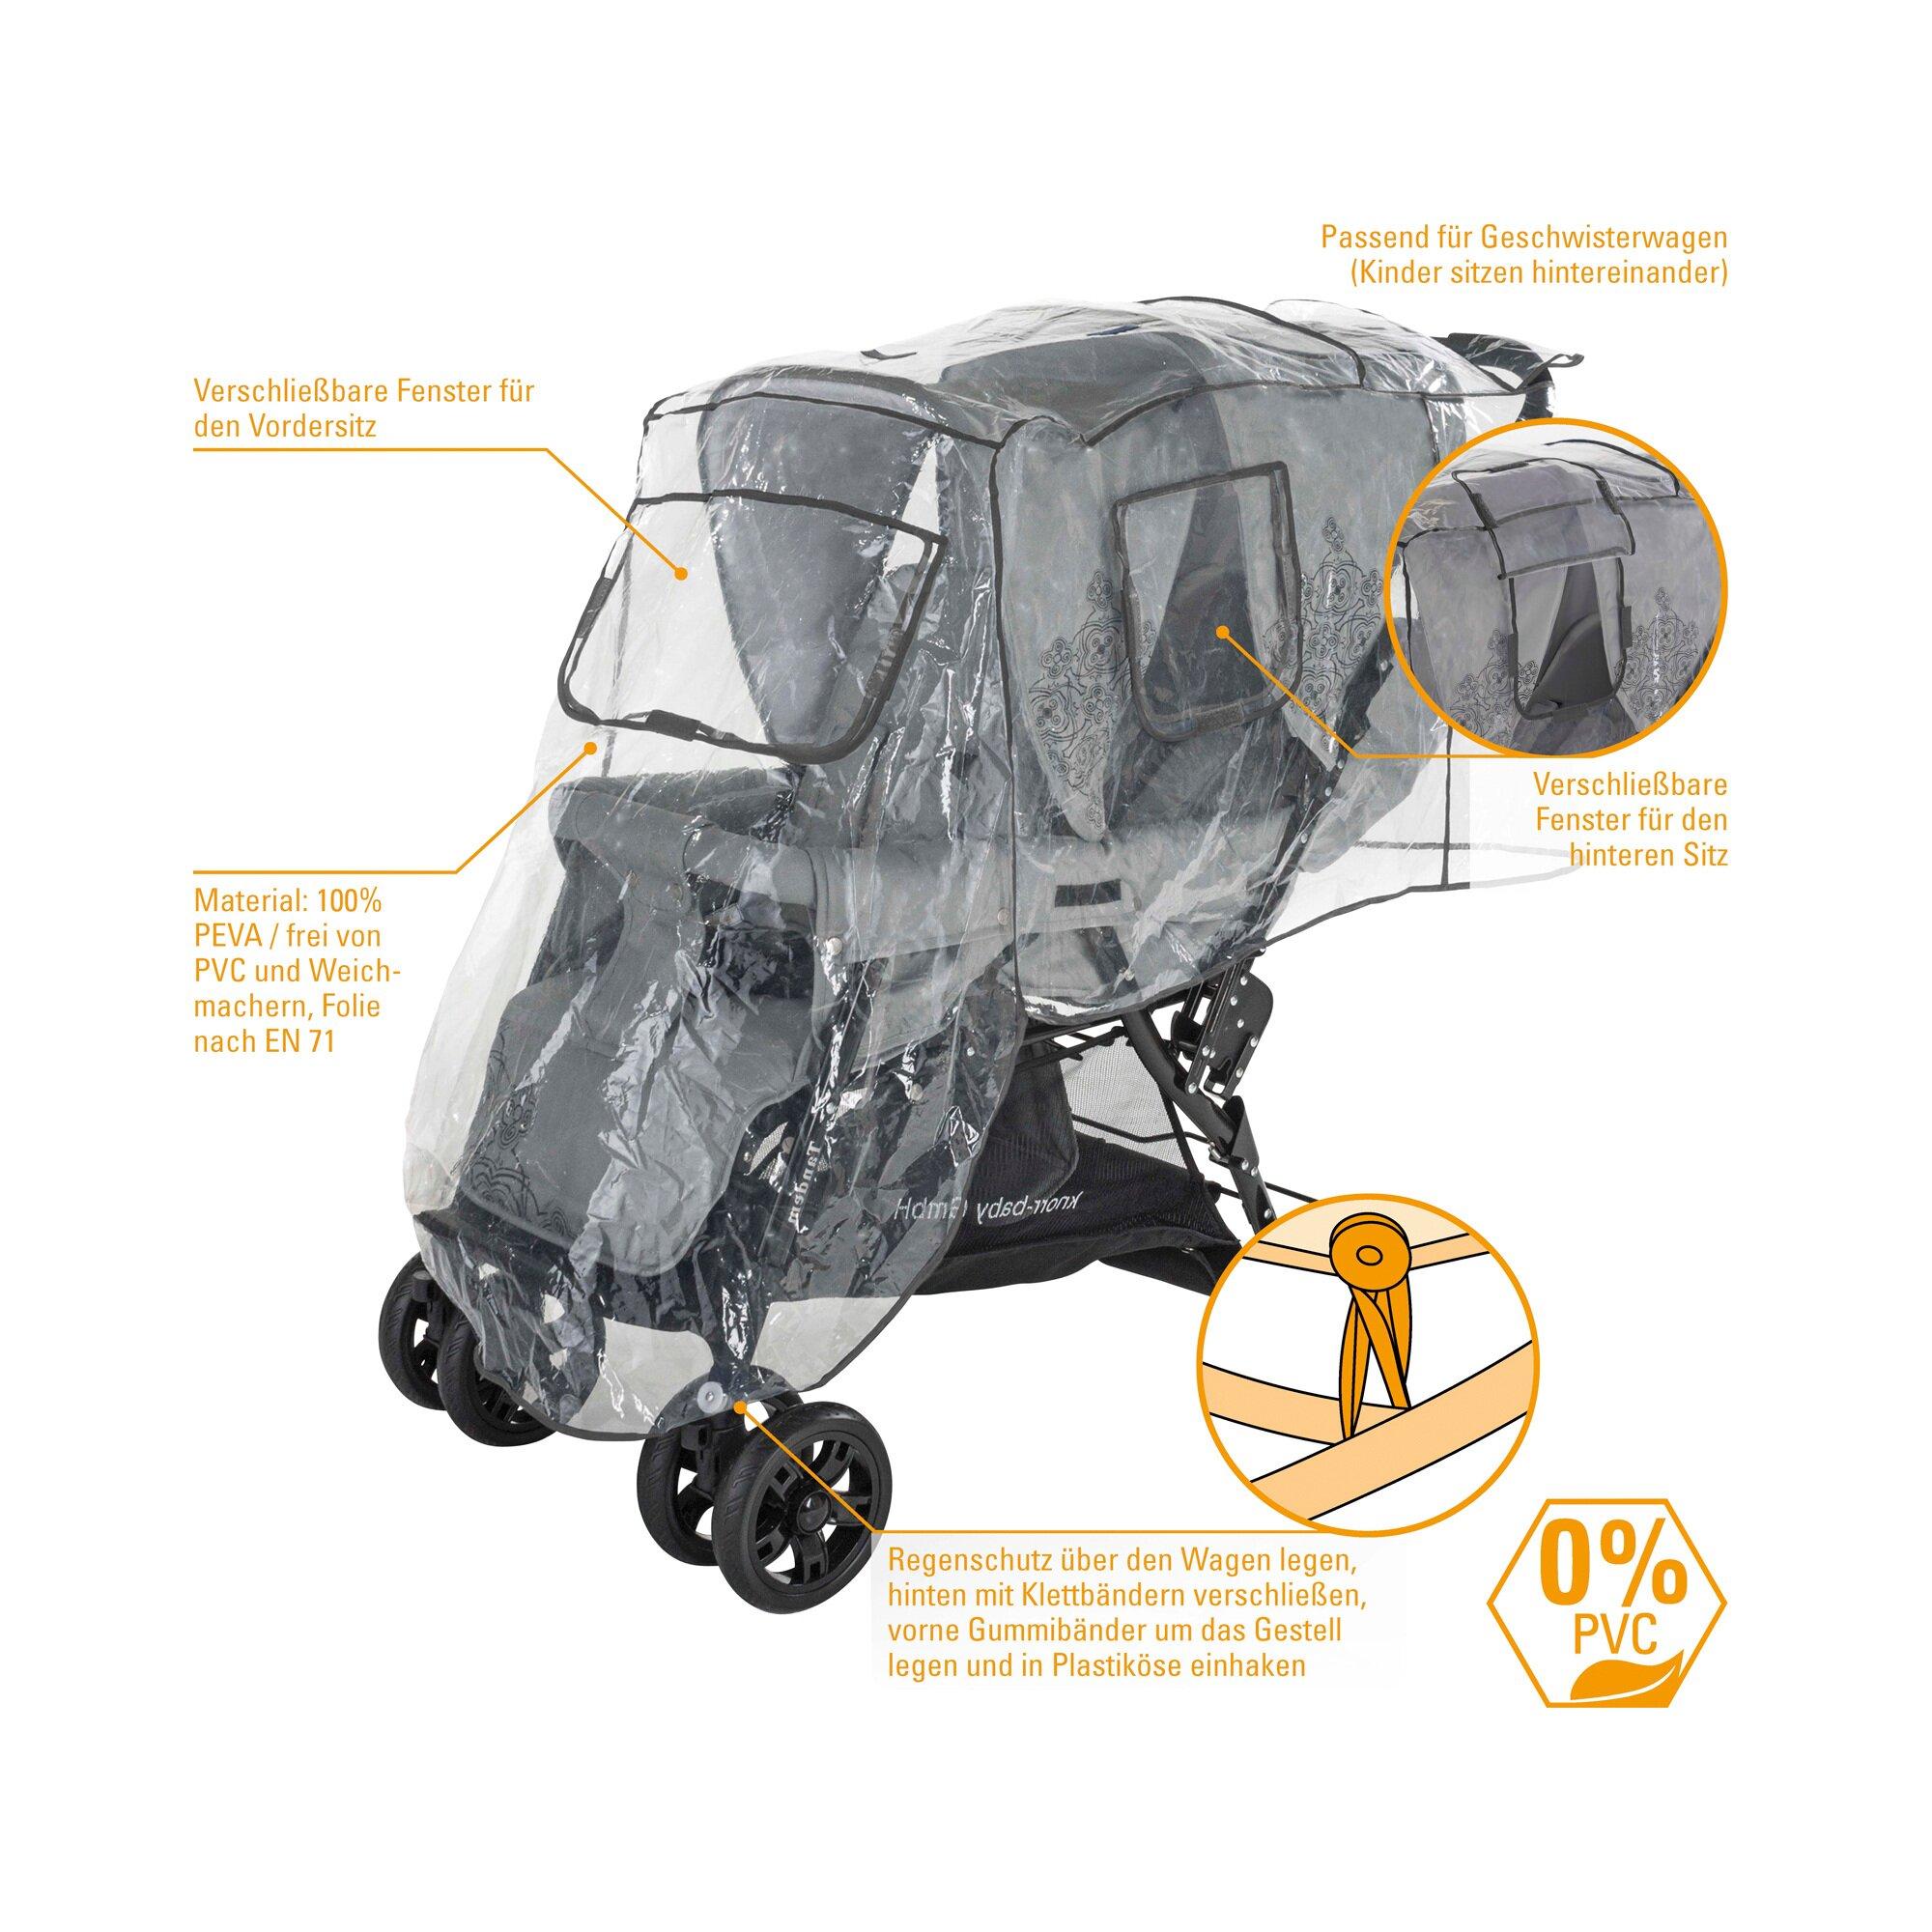 diago-universal-regenschutz-fur-kinderwagen-geschwisterwagen-transparent